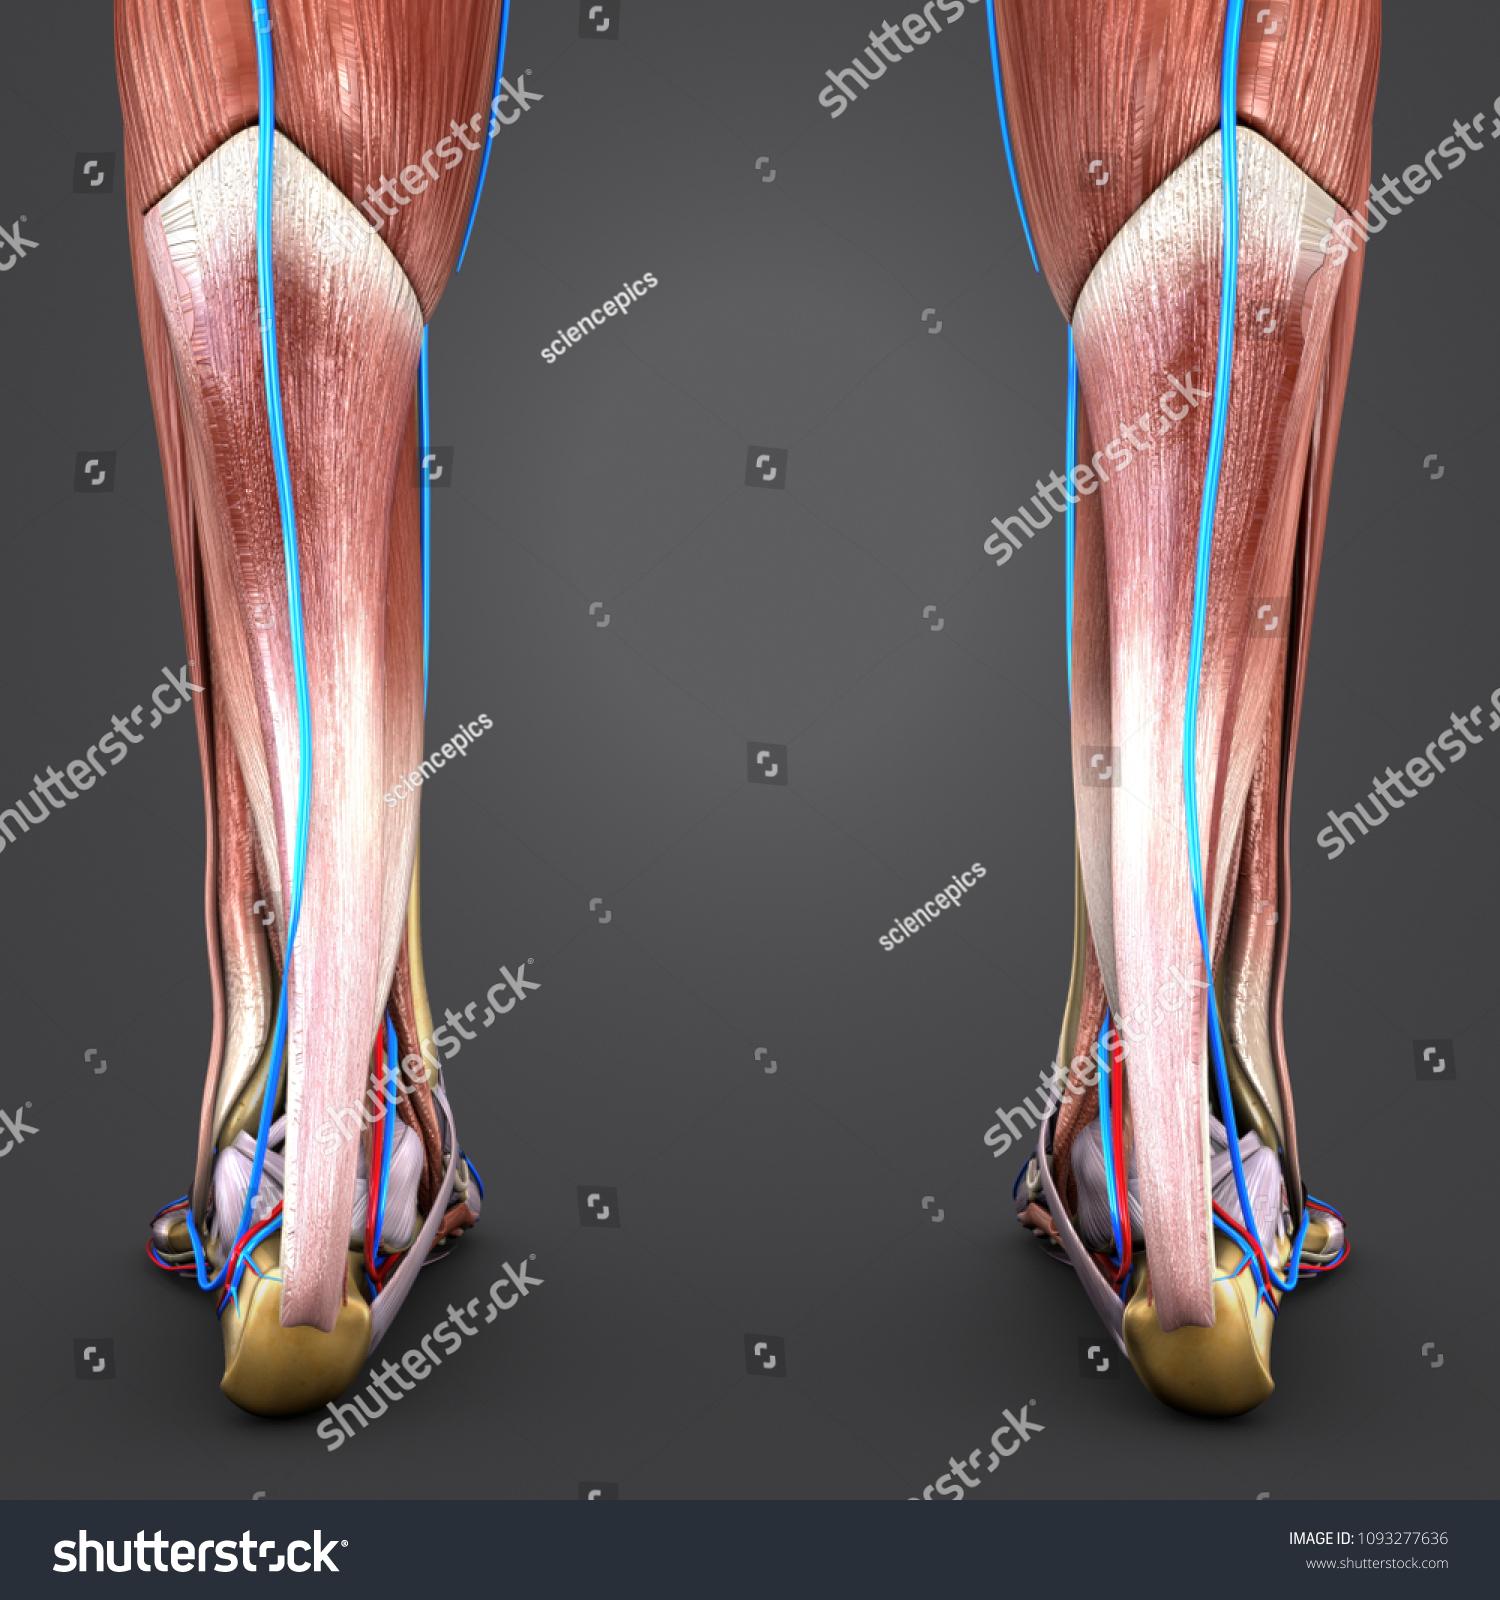 Royalty Free Stock Illustration Of Human Legs Muscle Anatomy